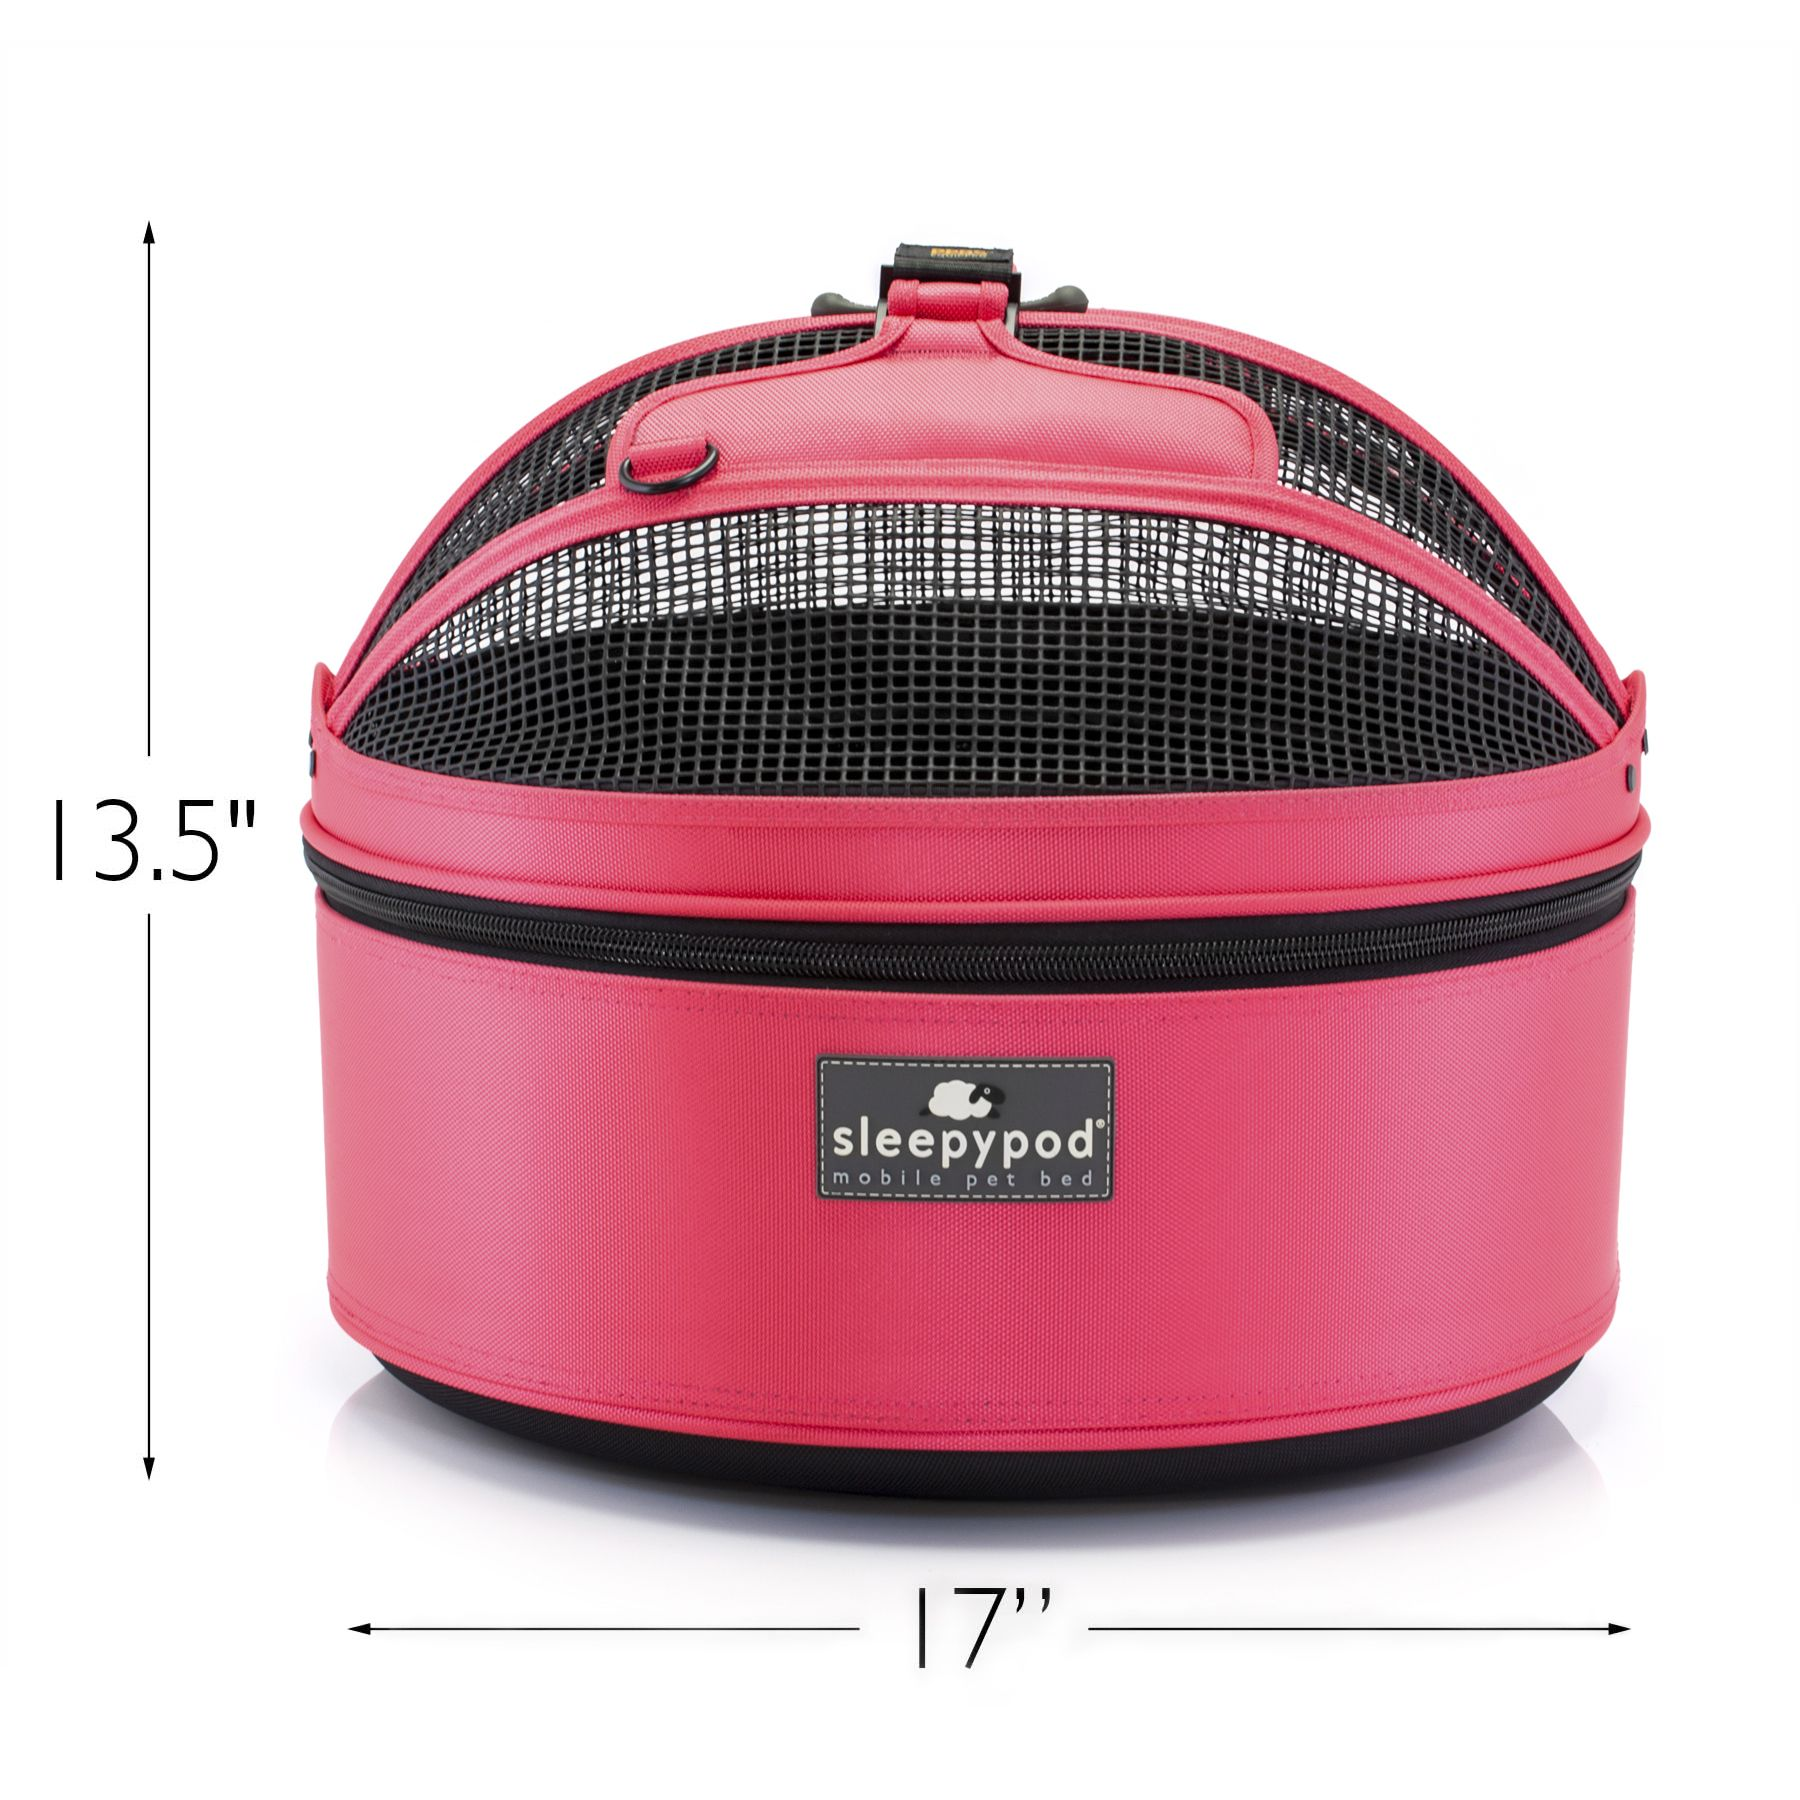 Sleepypod Cat carrier, Luxury pet carrier, Dog stroller